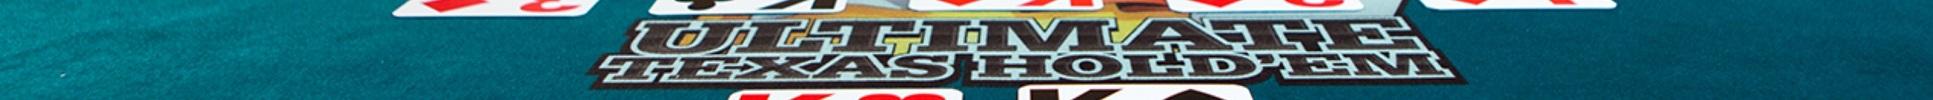 live ultimate texas holdem poker